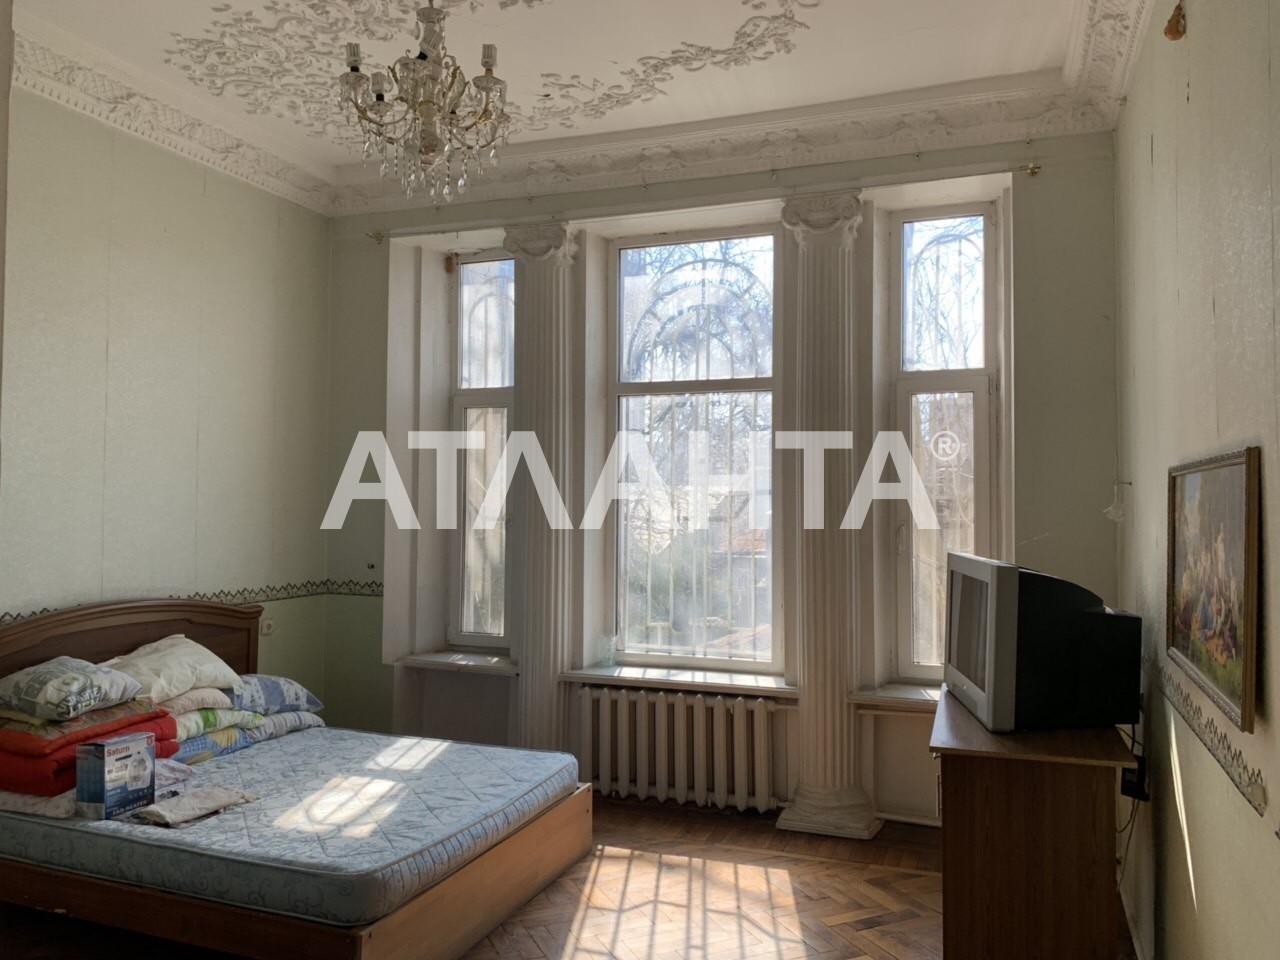 Продается 3-комнатная Квартира на ул. Французский Бул. (Пролетарский Бул.) — 85 000 у.е. (фото №6)